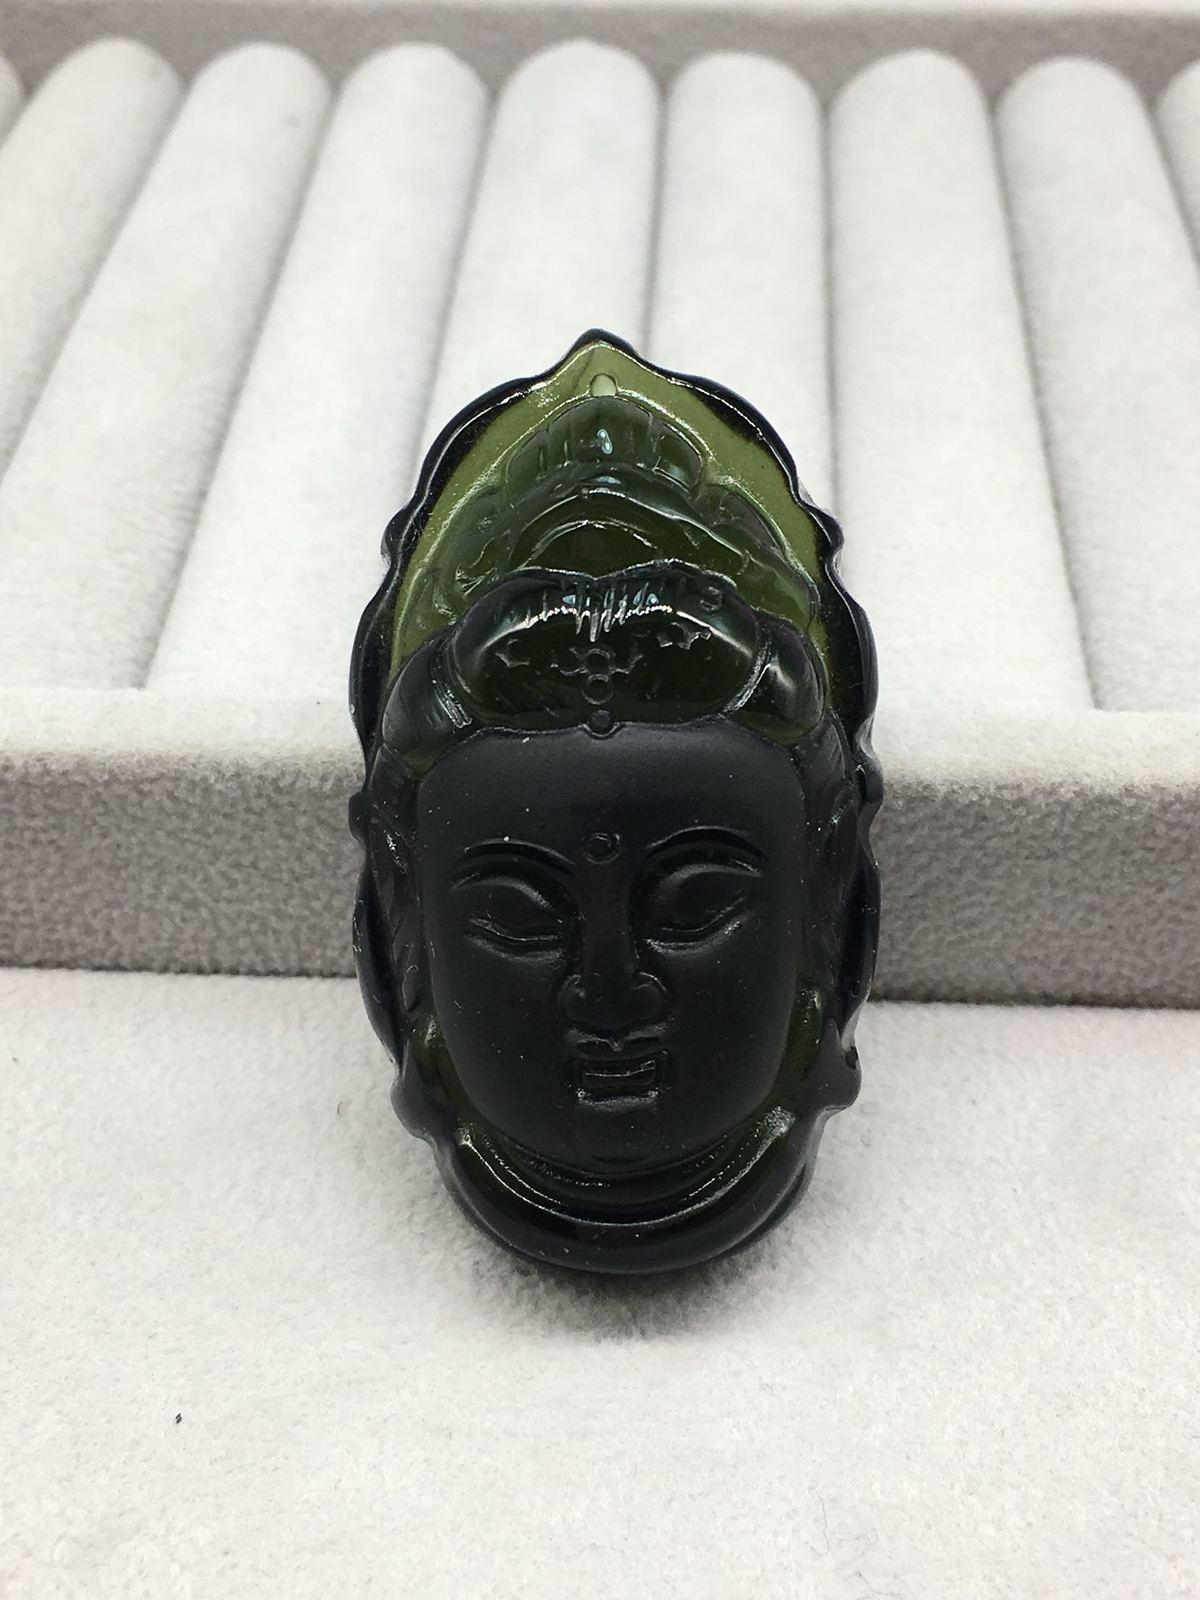 Quality Goods Natural Czekh Maitreya Buddha Head Pendant Bracelet Protect Safety Green Meteorite Pendant mcd200 16io1 [west] quality goods page 1